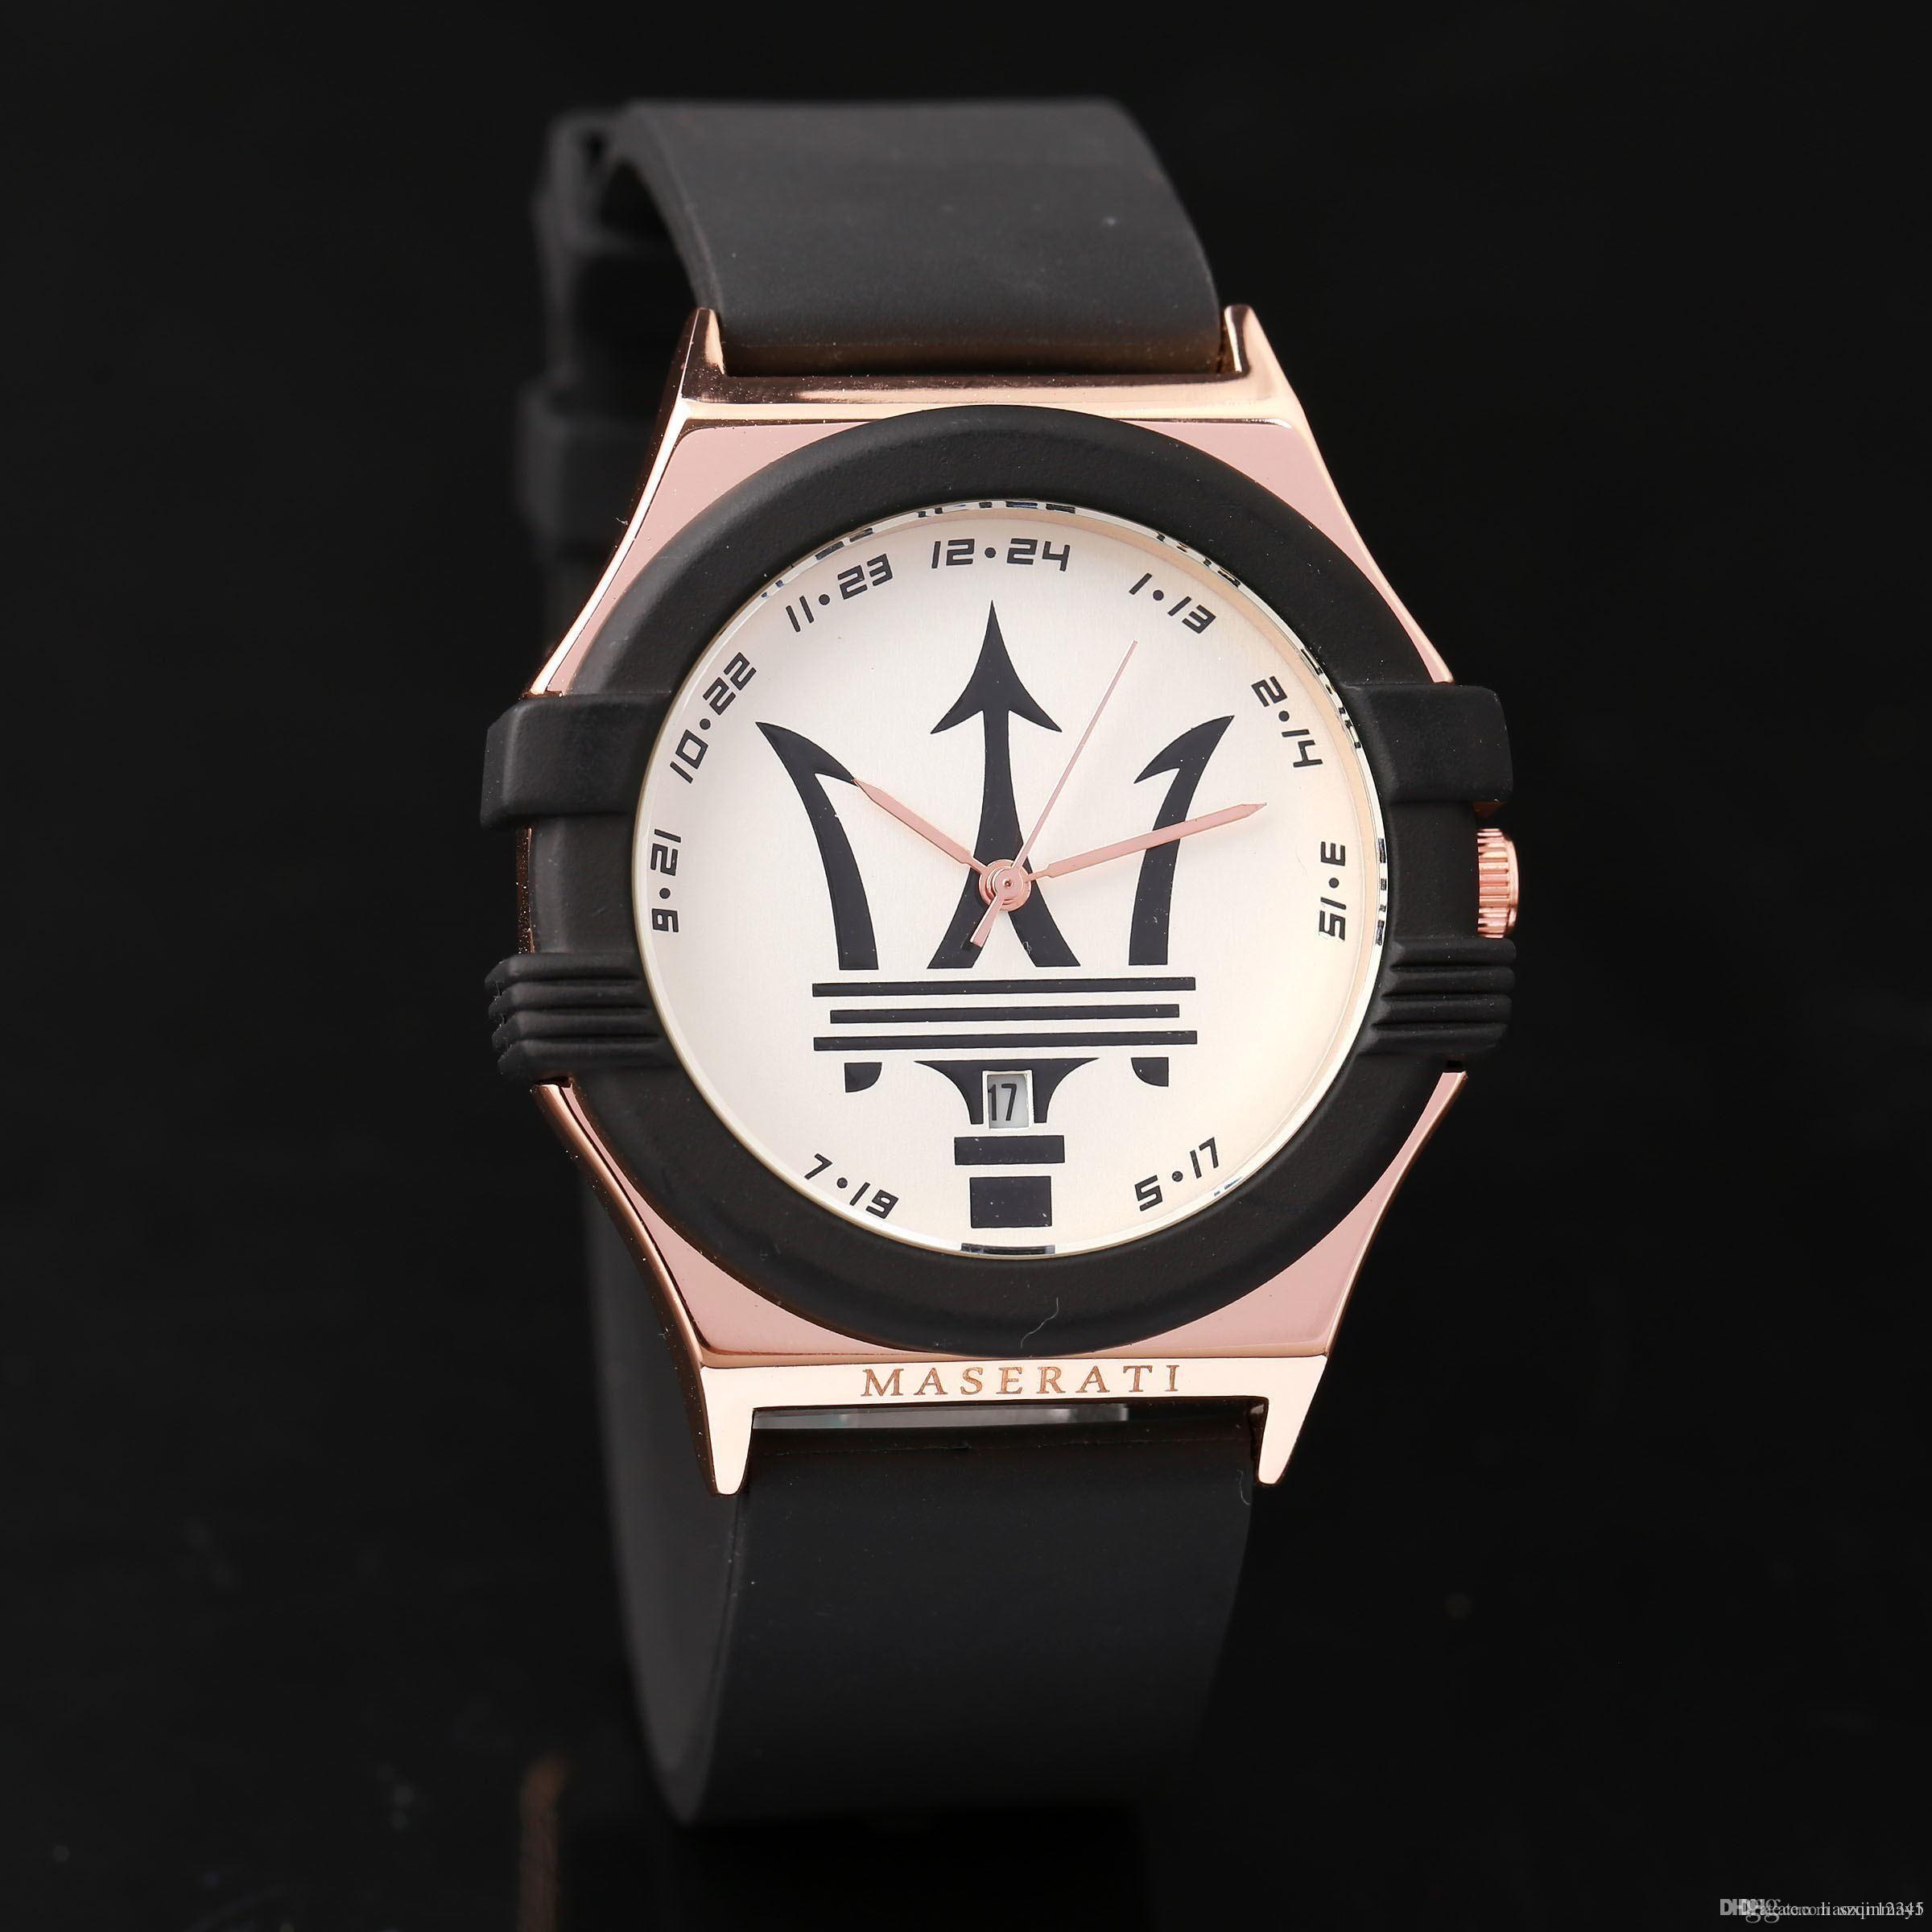 2017 maserati Casual Leather Watches VOLARE Women men Busines Quartz Watch  wristwatches